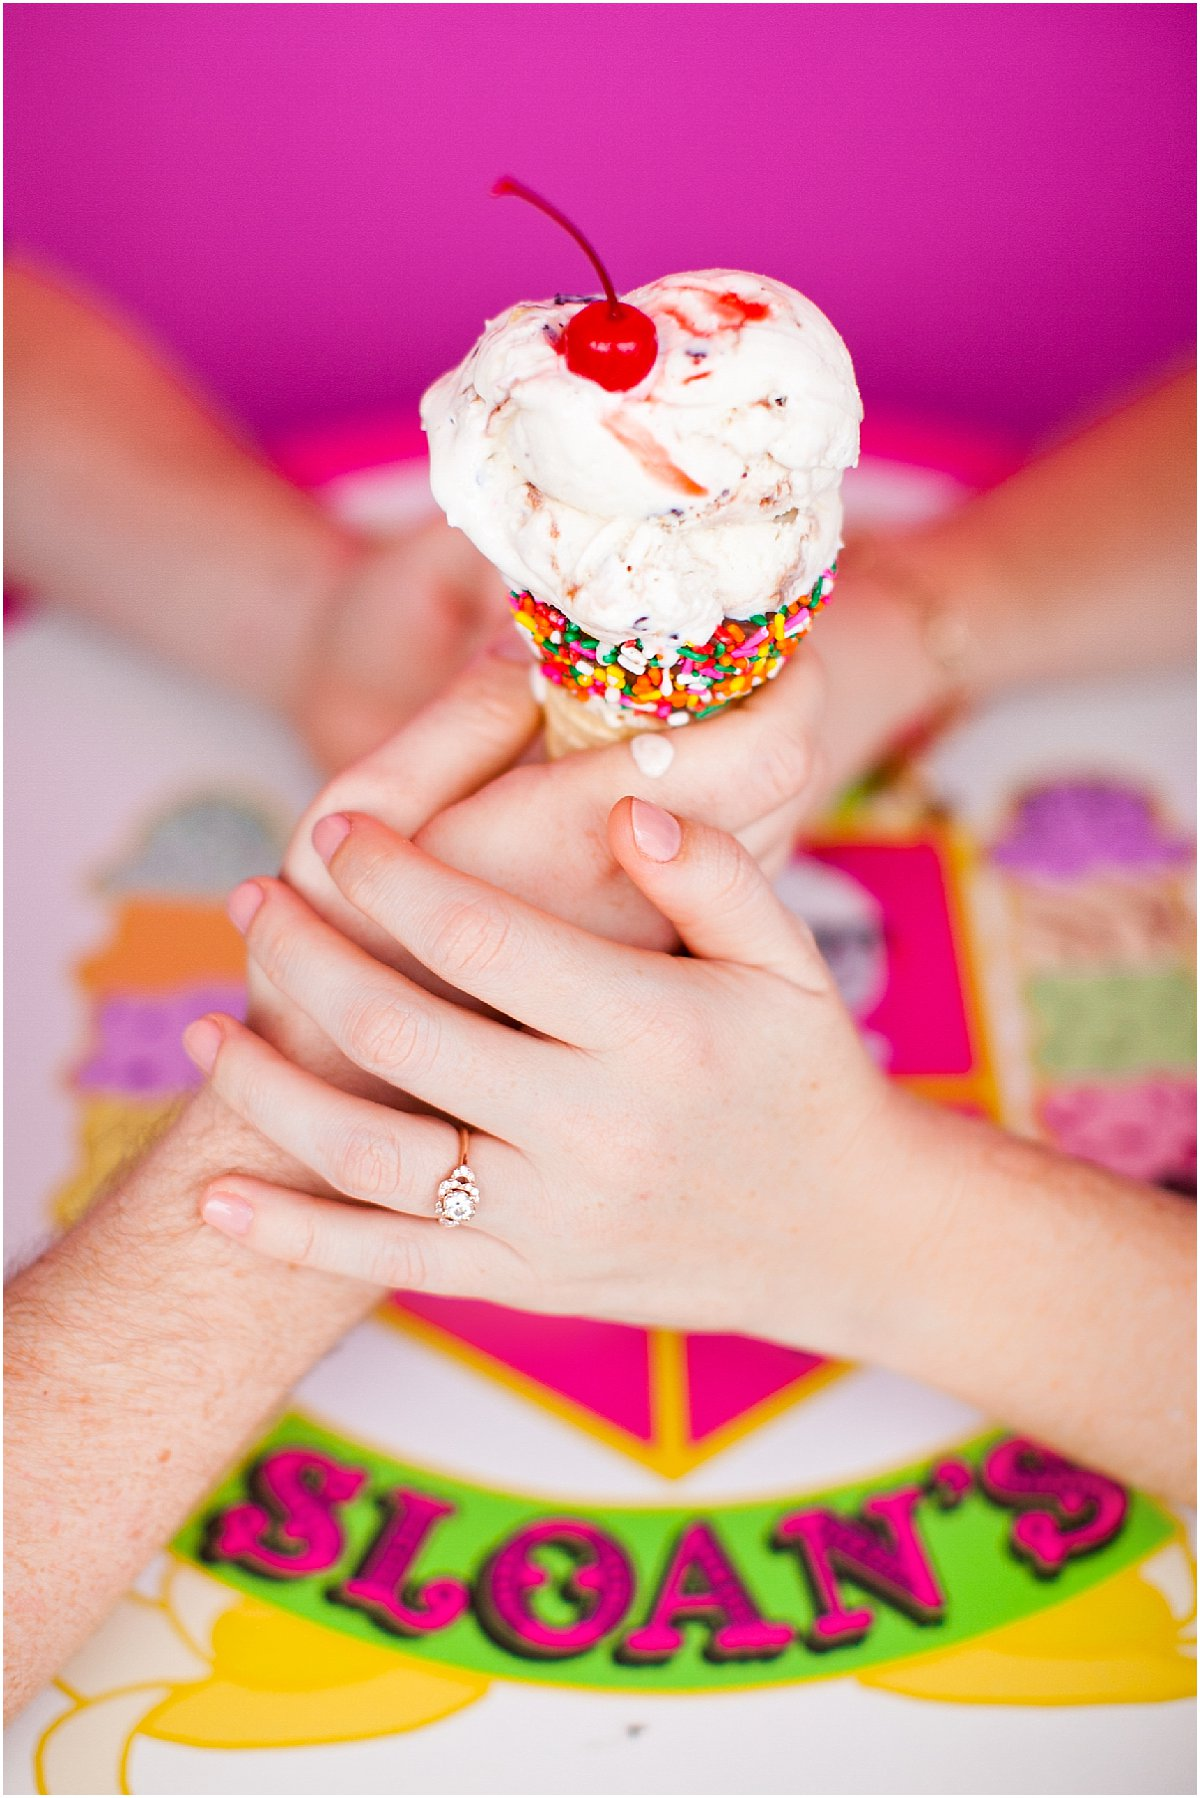 Palm Beach Wedding_Chelsea Victoria Photography_Sloans Ice Cream